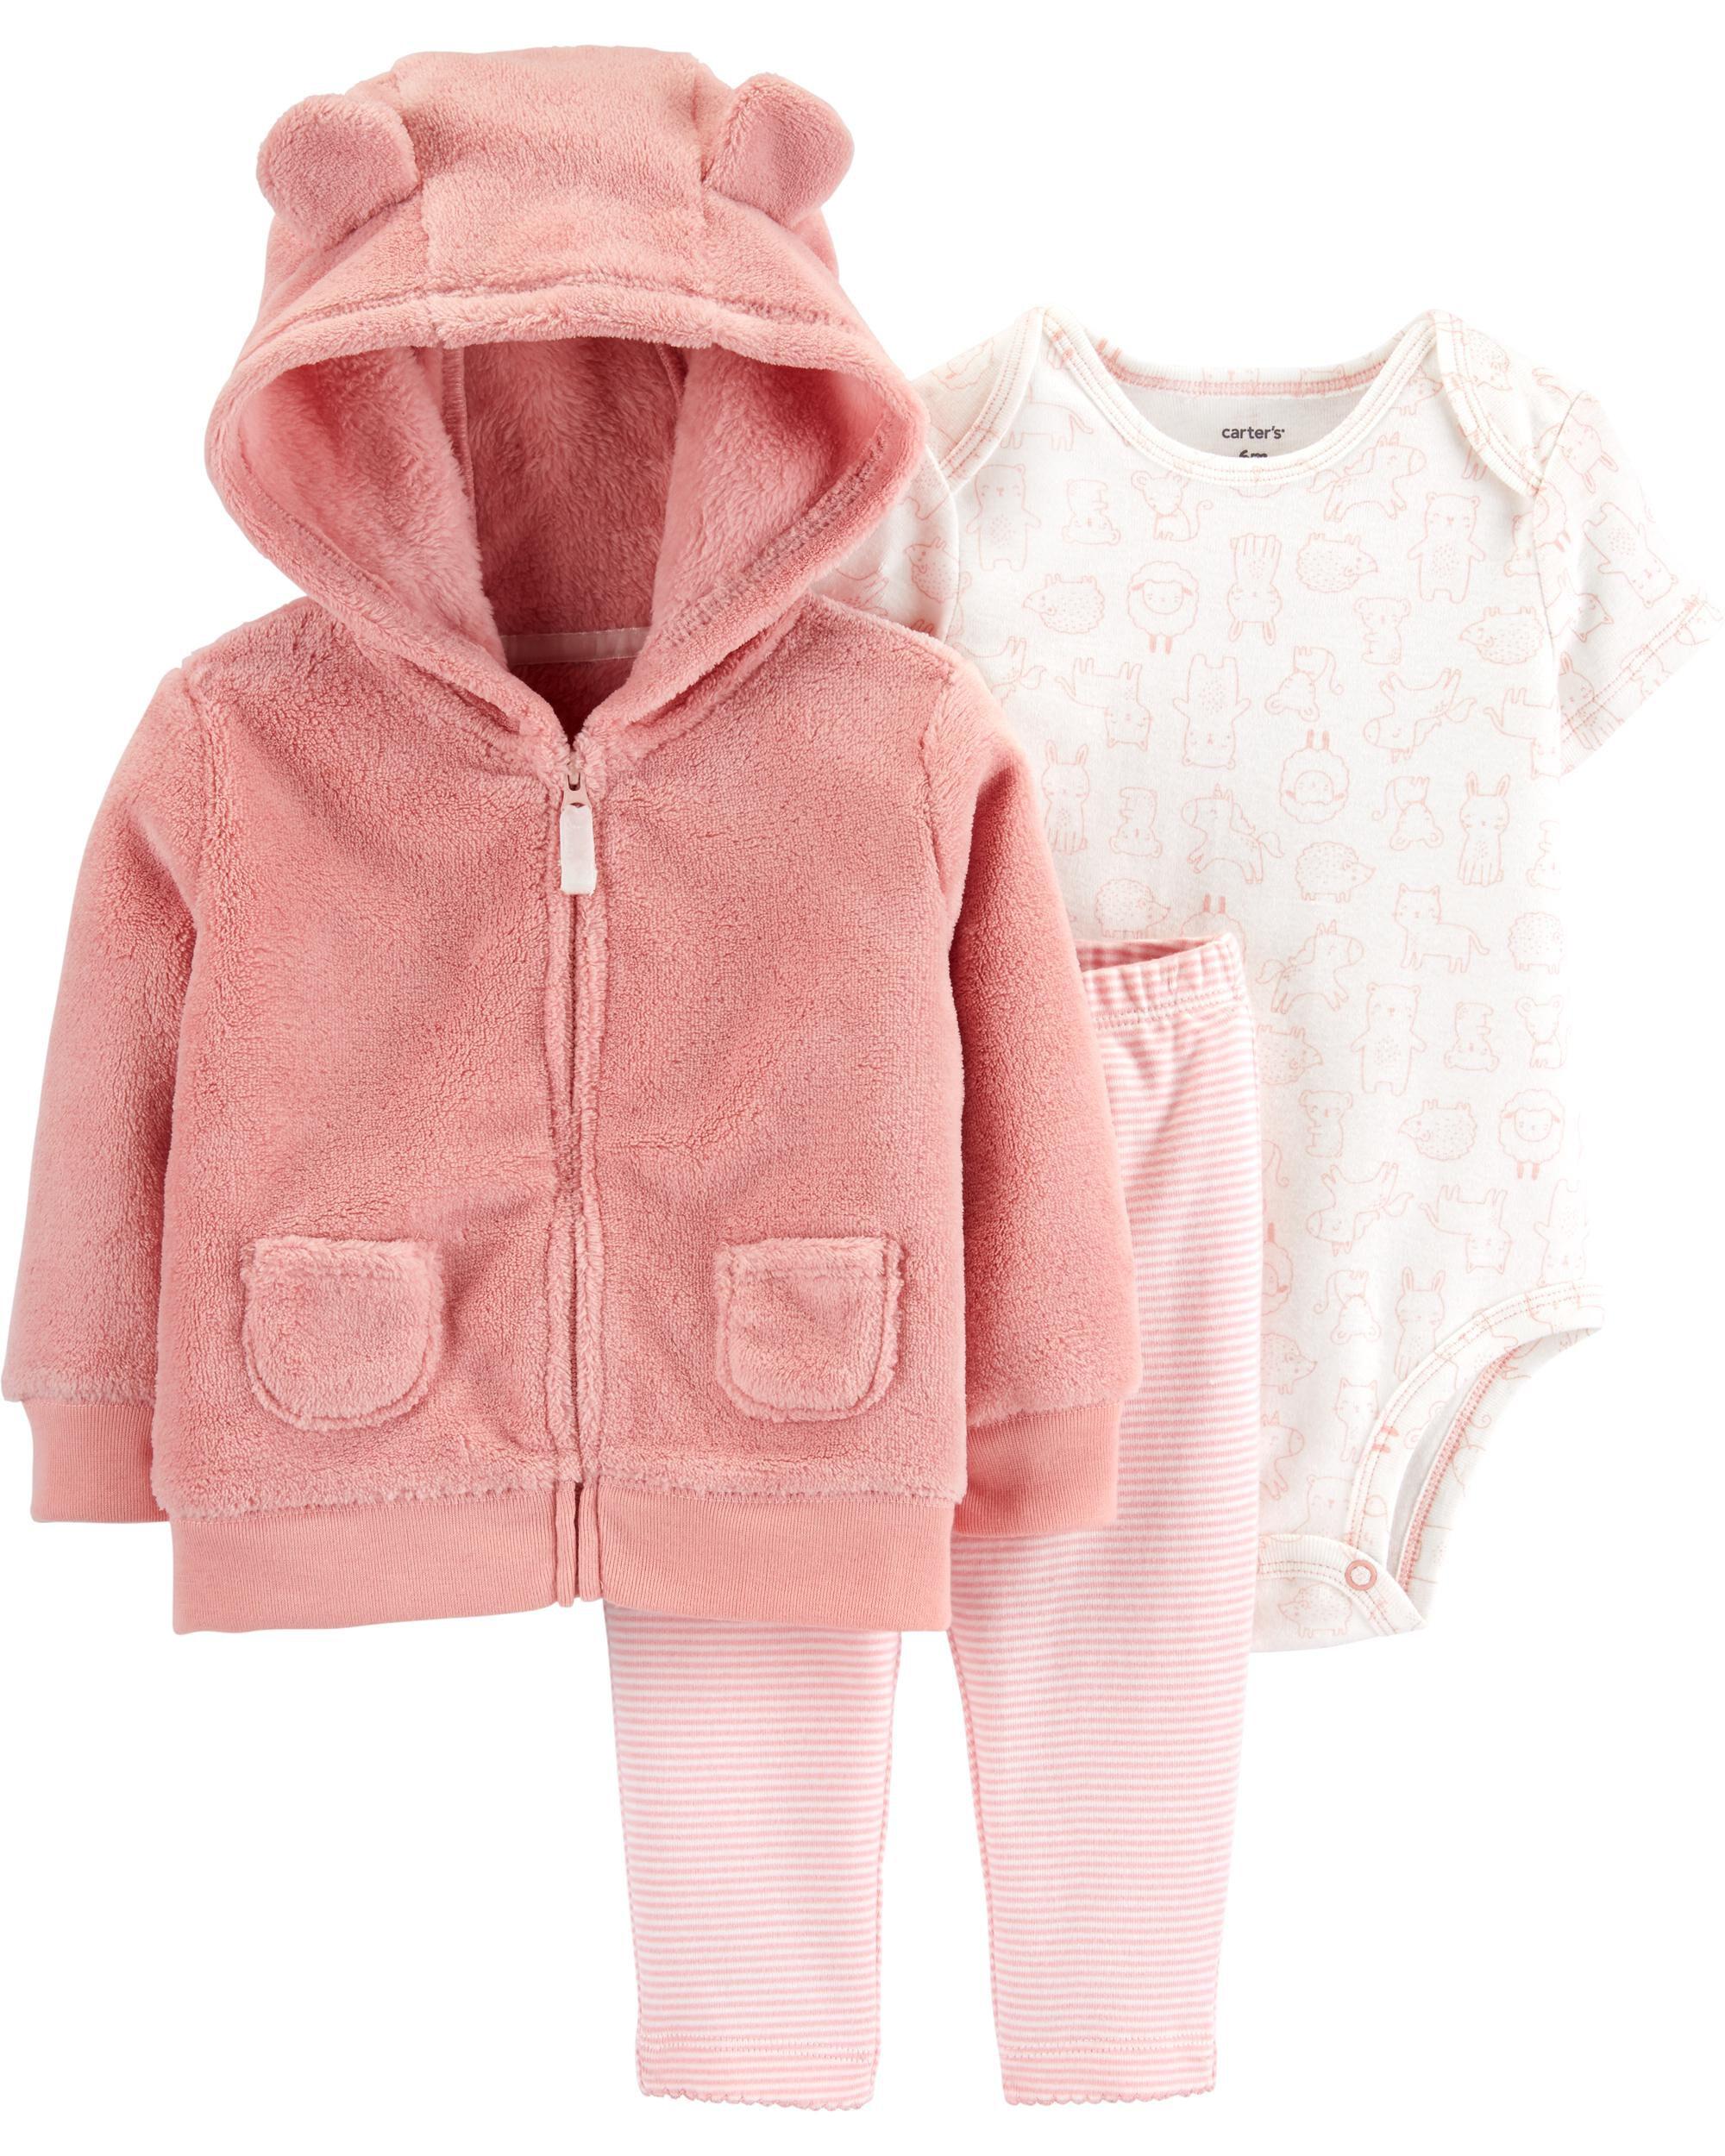 3-Piece Fuzzy Little Jacket Set